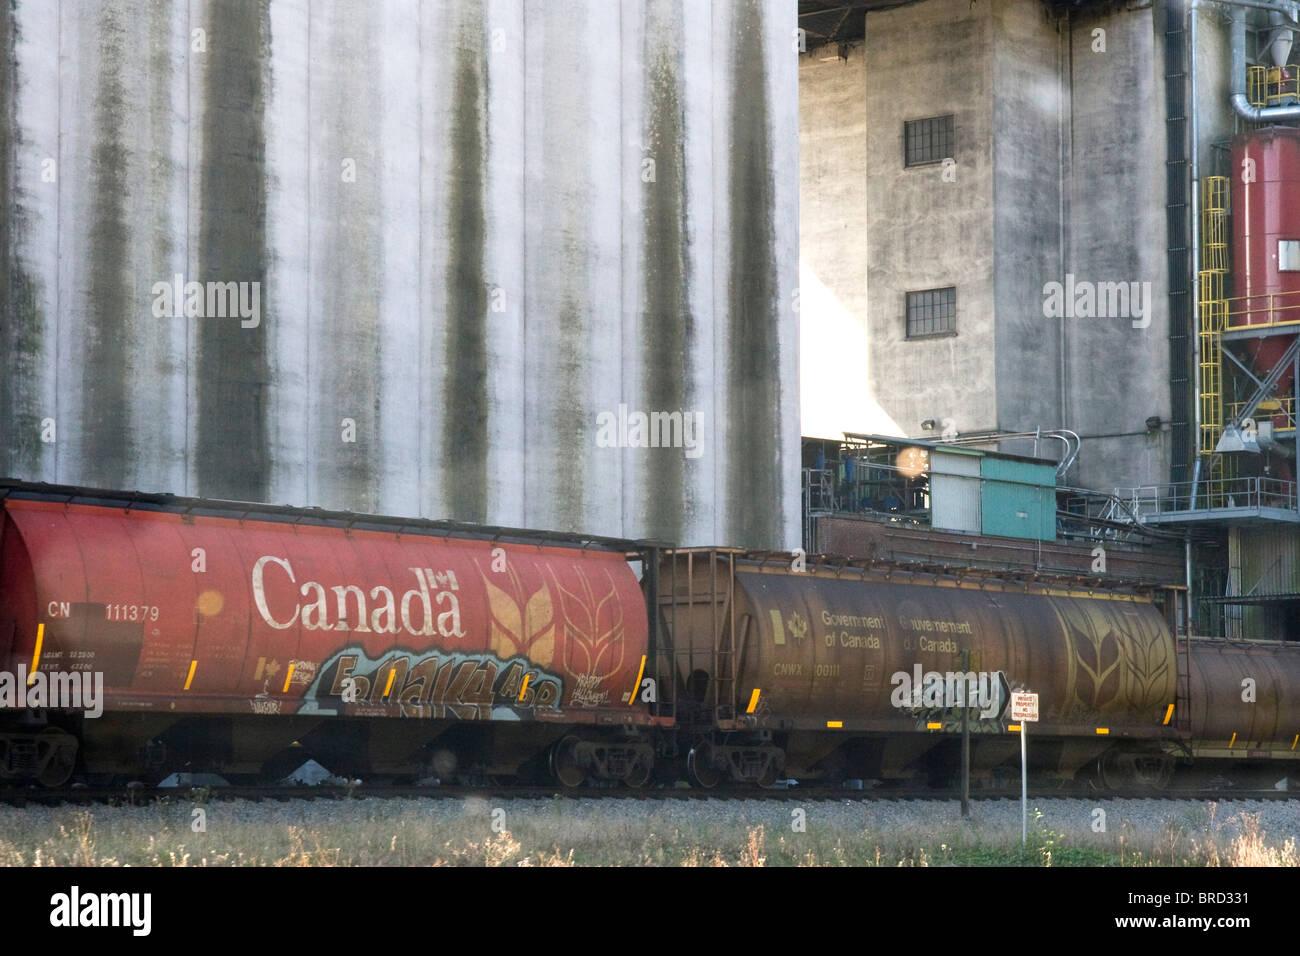 Grain Hopper Stock Photos & Grain Hopper Stock Images - Alamy